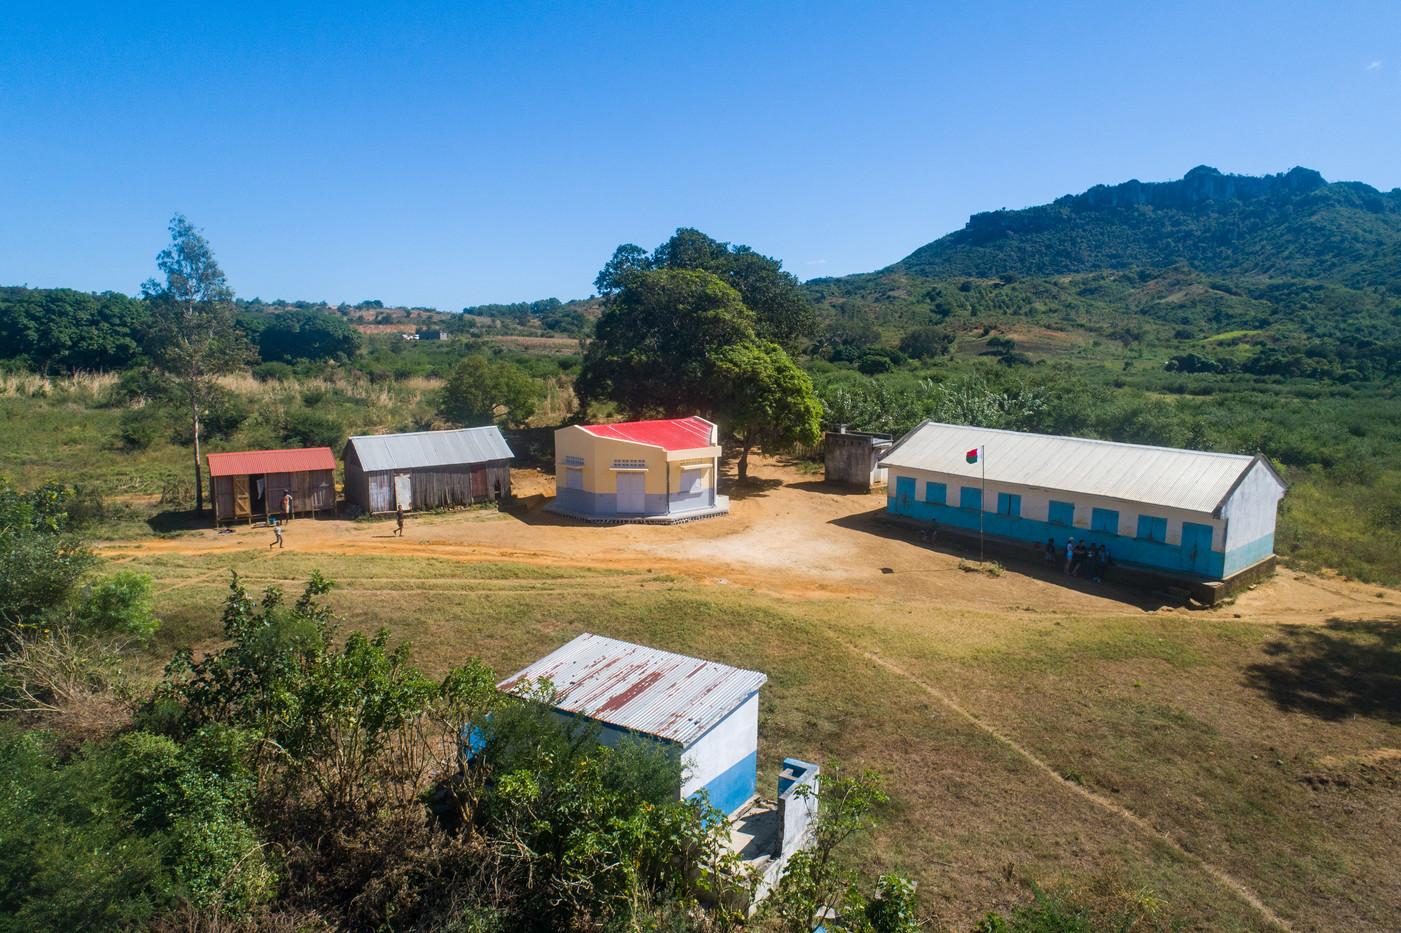 The school complex